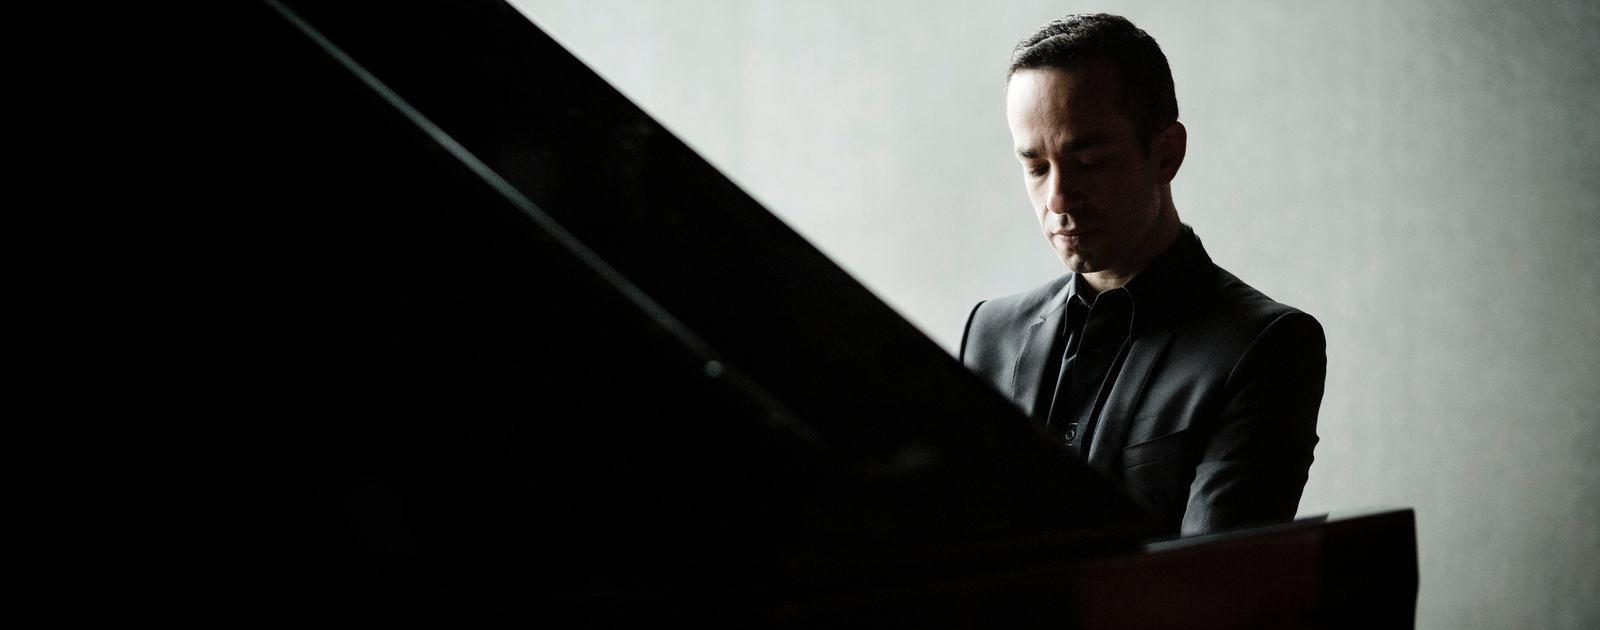 Inon Barnatan 2014- Pianist.Photo: Marco Borggreve